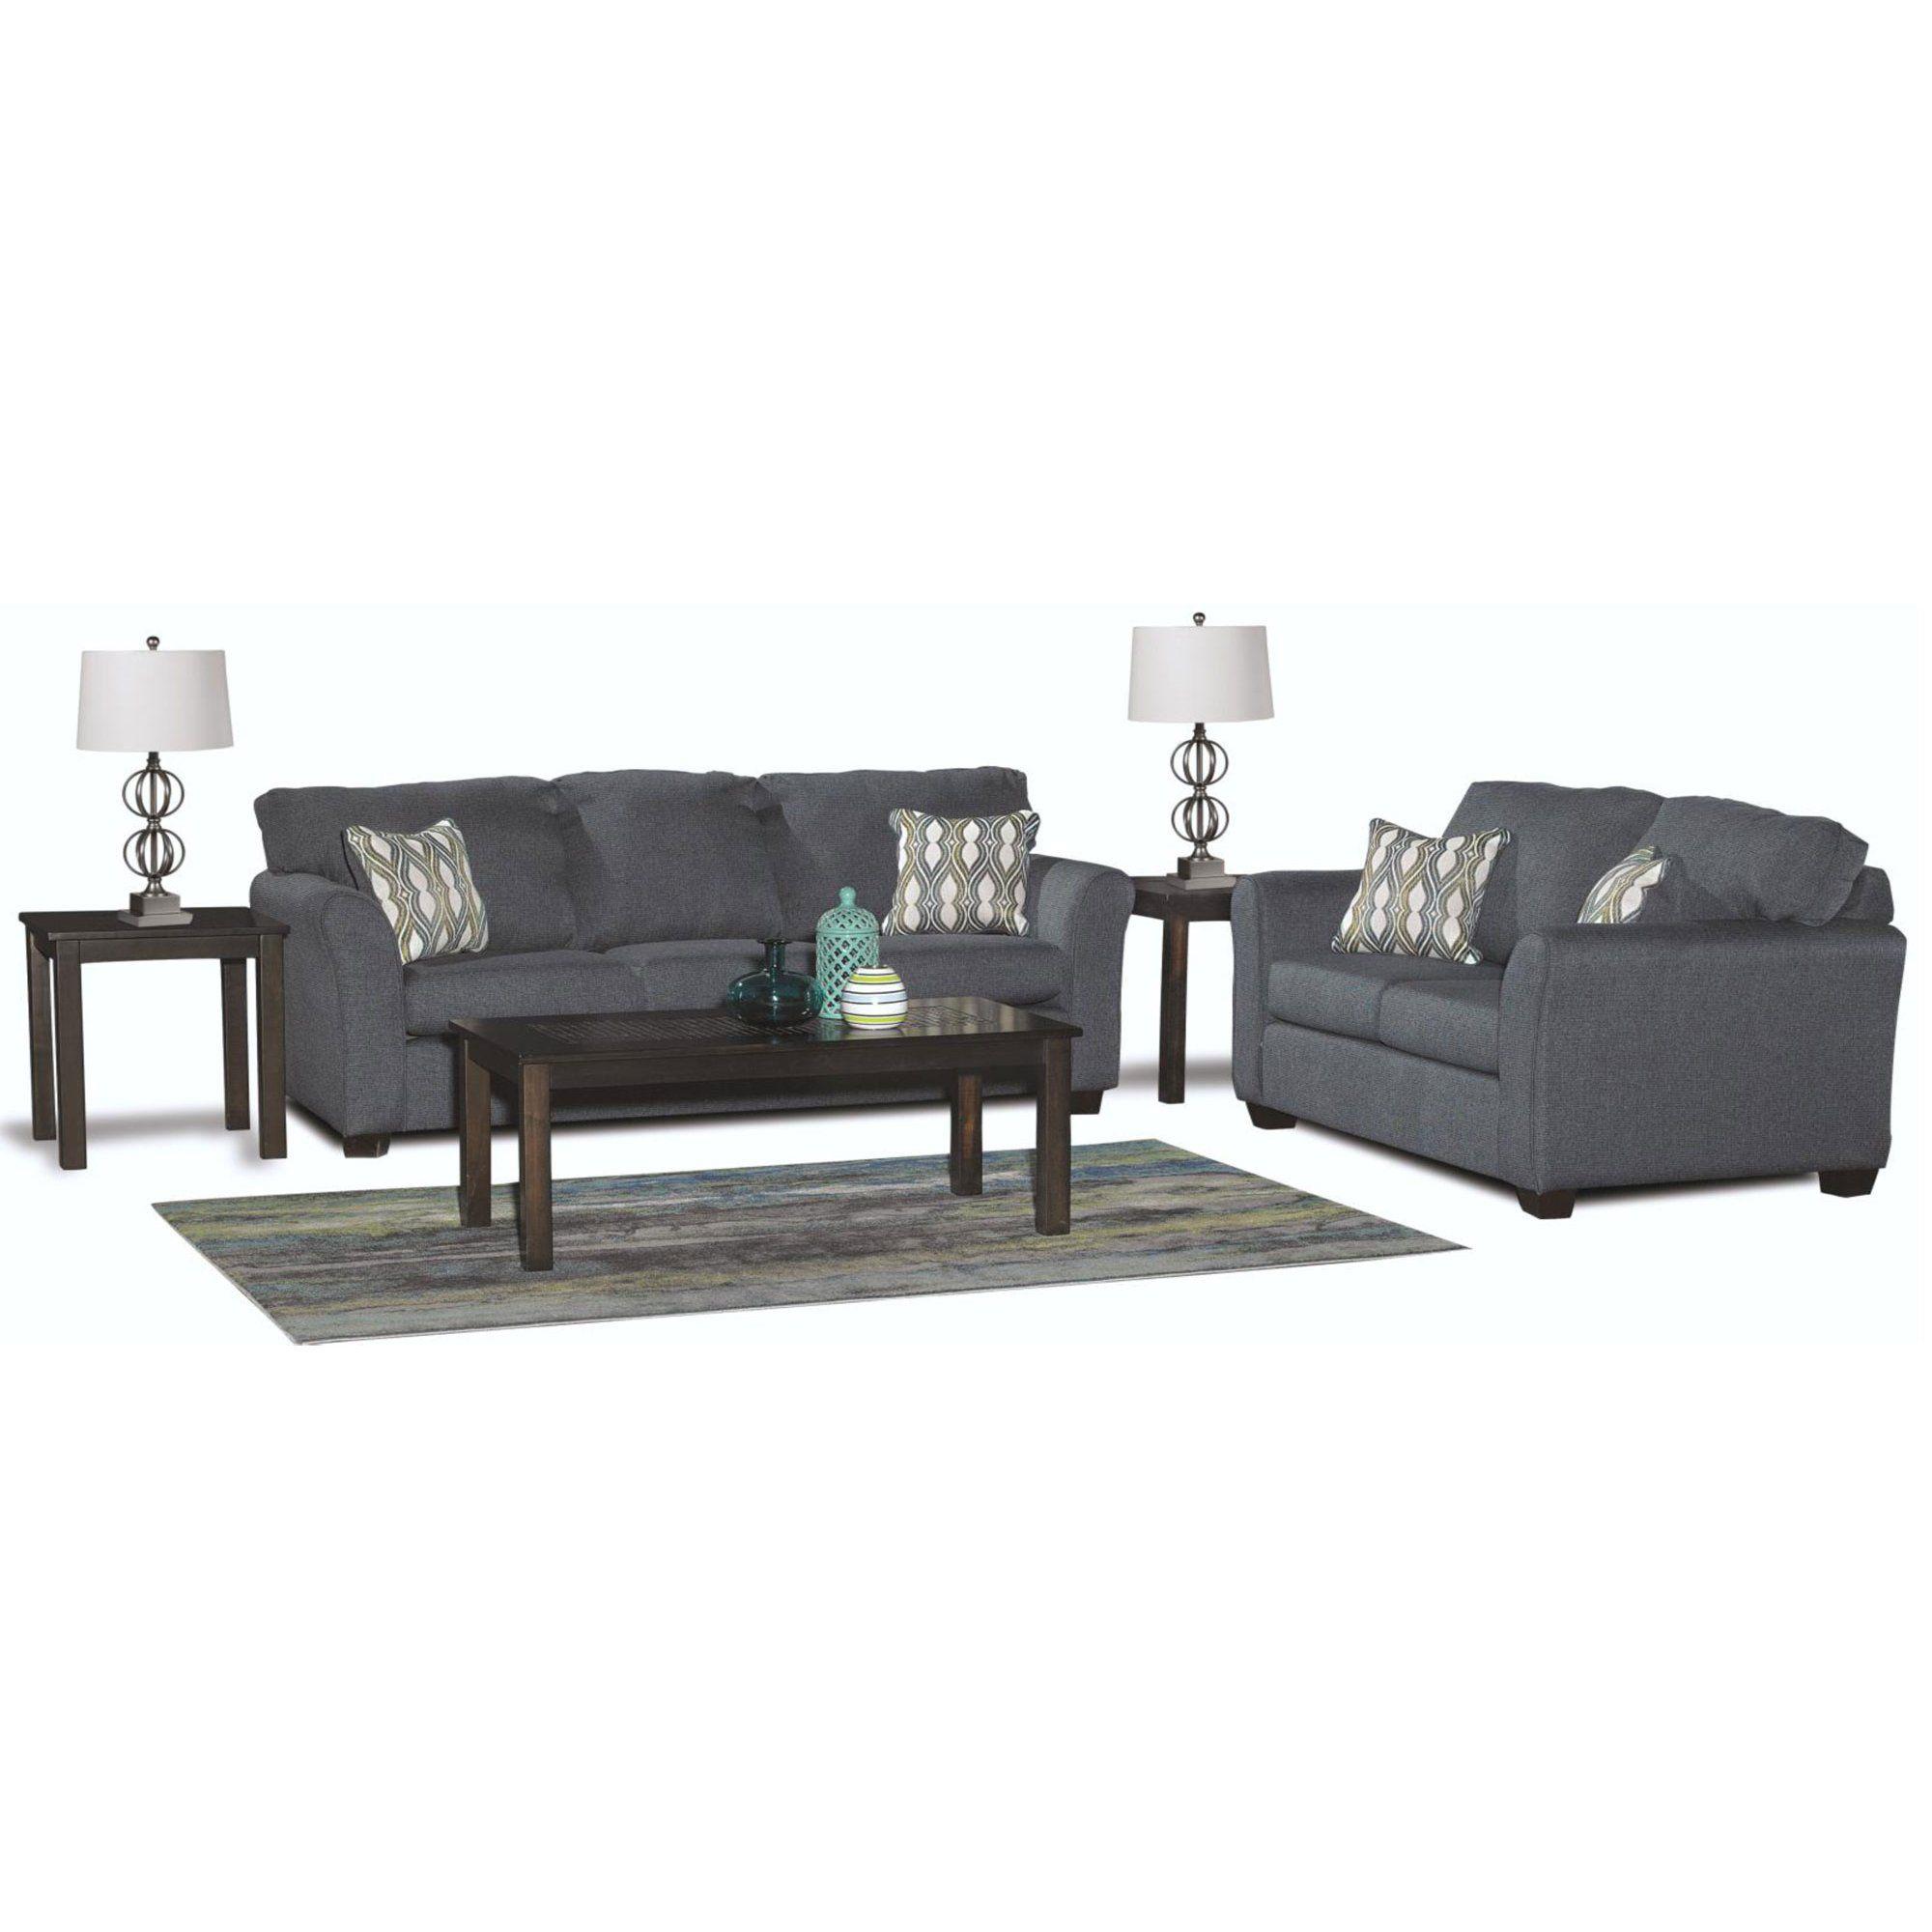 Best Contemporary Blue 7 Piece Living Room Set Wall St 400 x 300